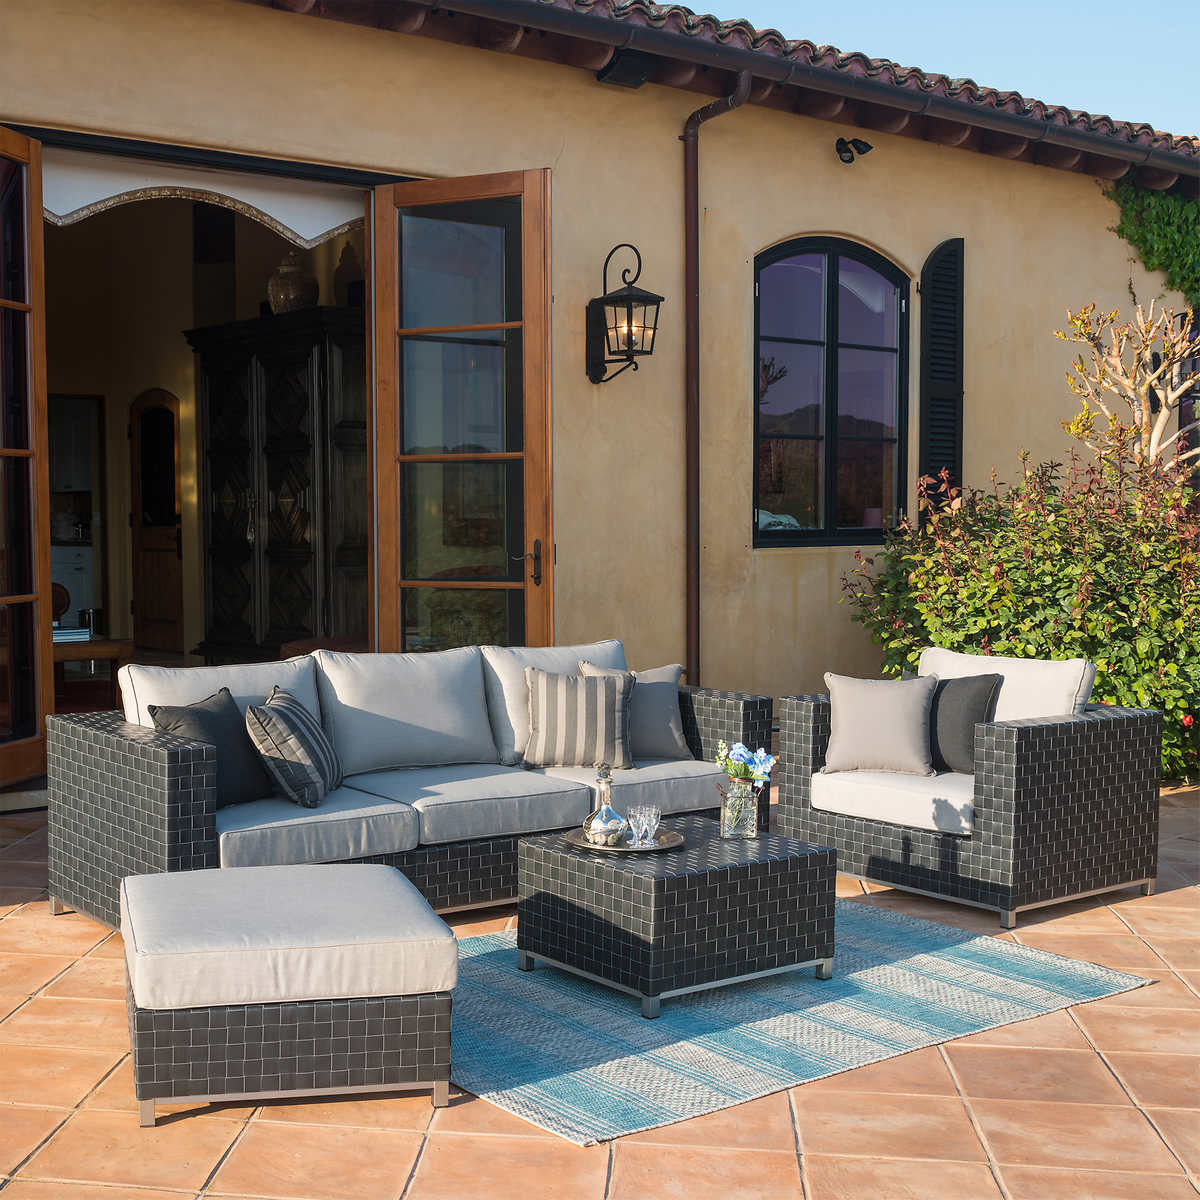 Costco Furniture Coupons: Soho 6-piece Seating Set By Sirio Oho 6-piece Deep Seating Set